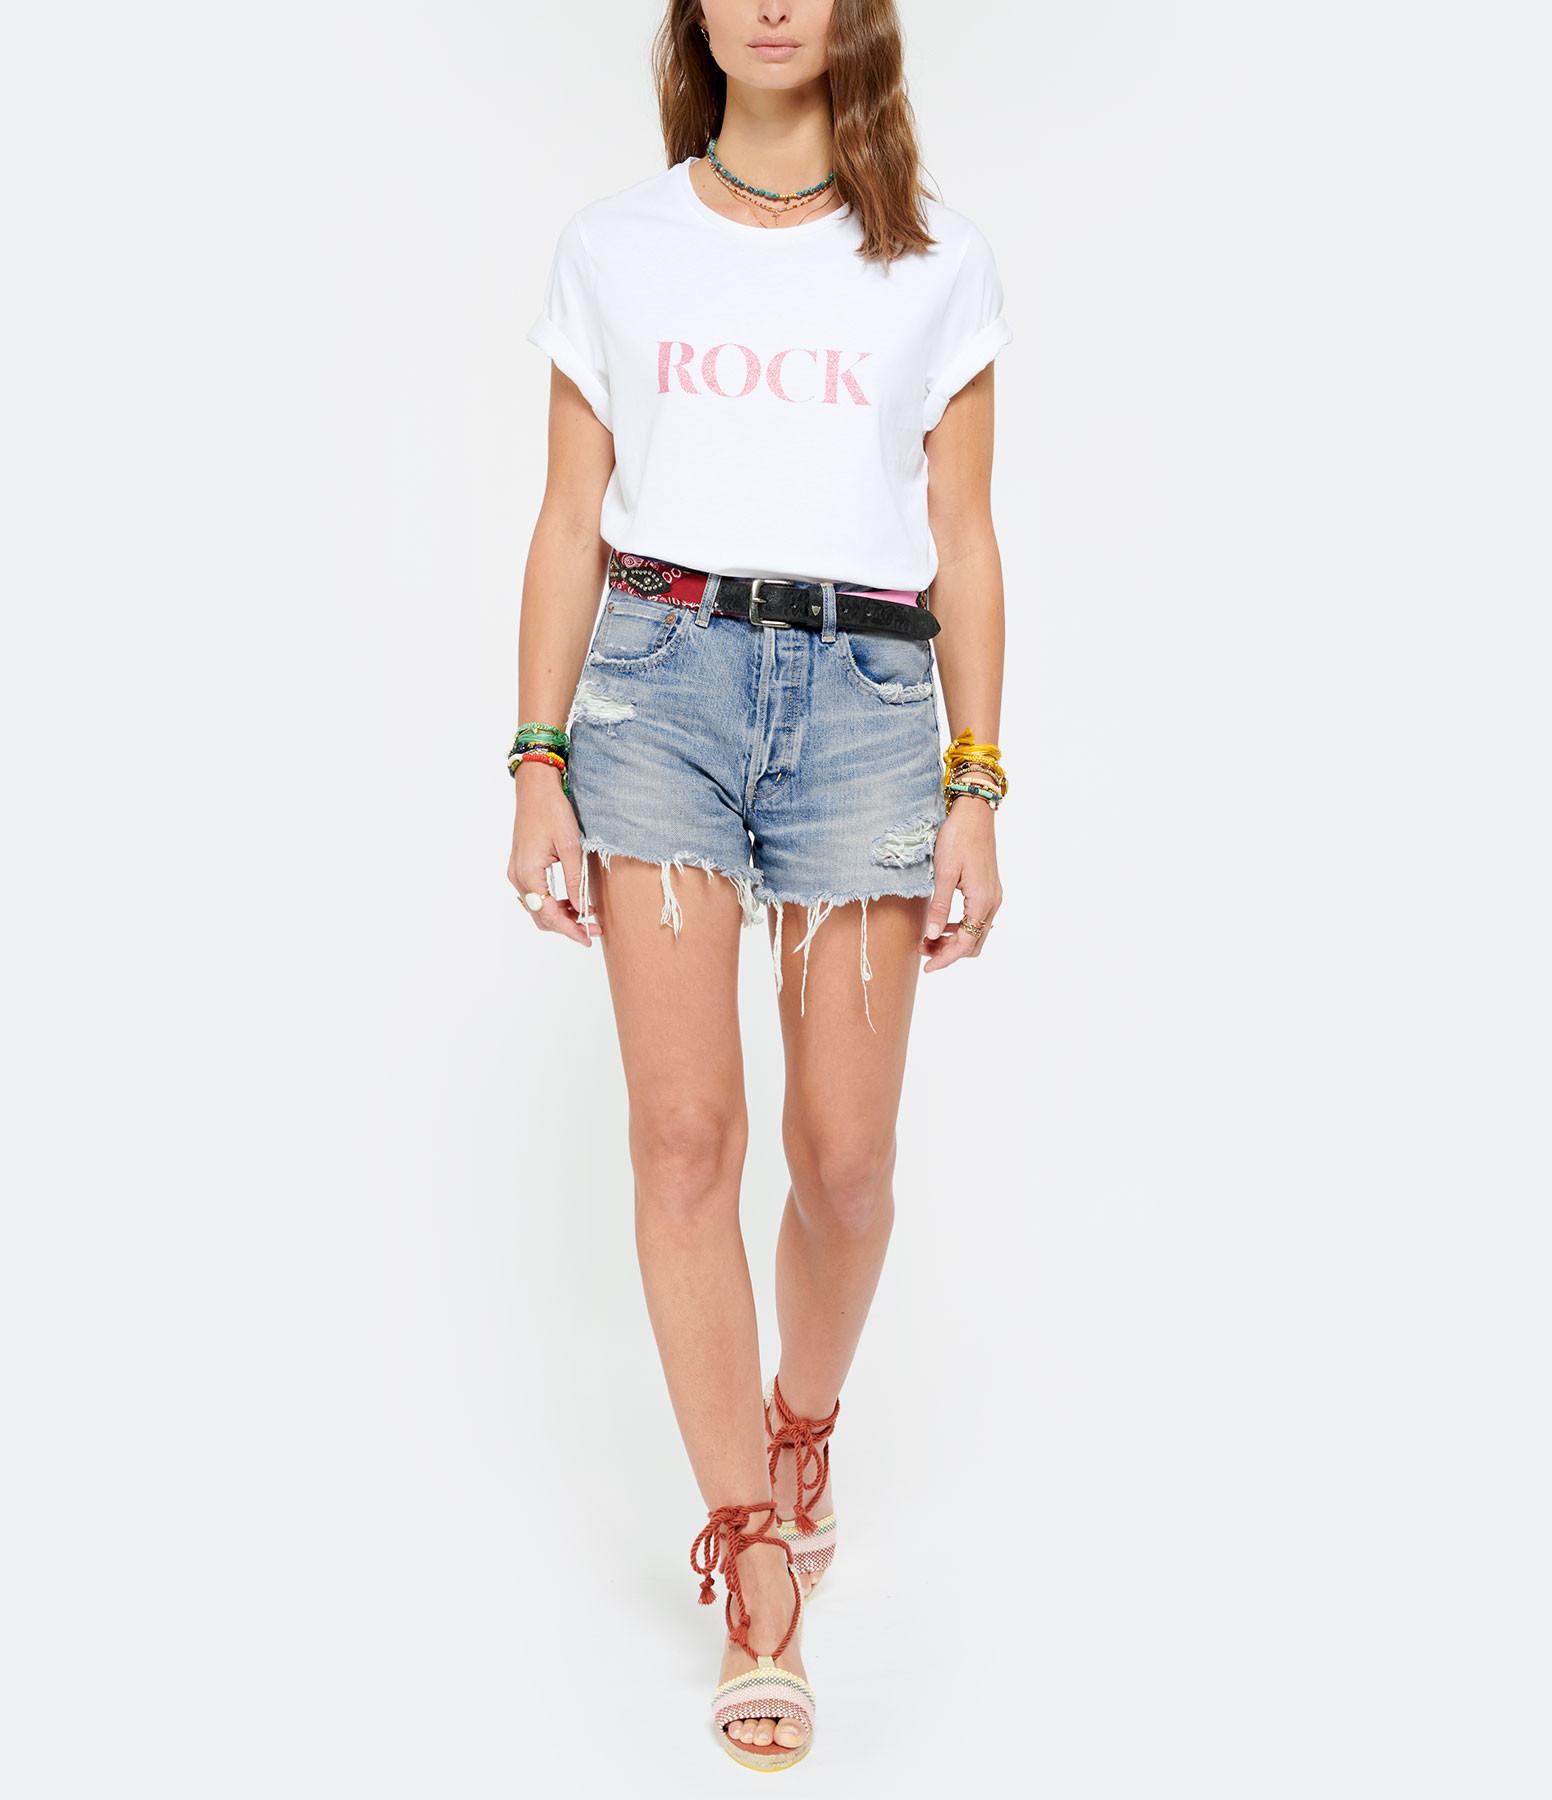 JEANNE VOULAND - Tee-shirt Cris Coton Biologique Rock Love Glitter Rose